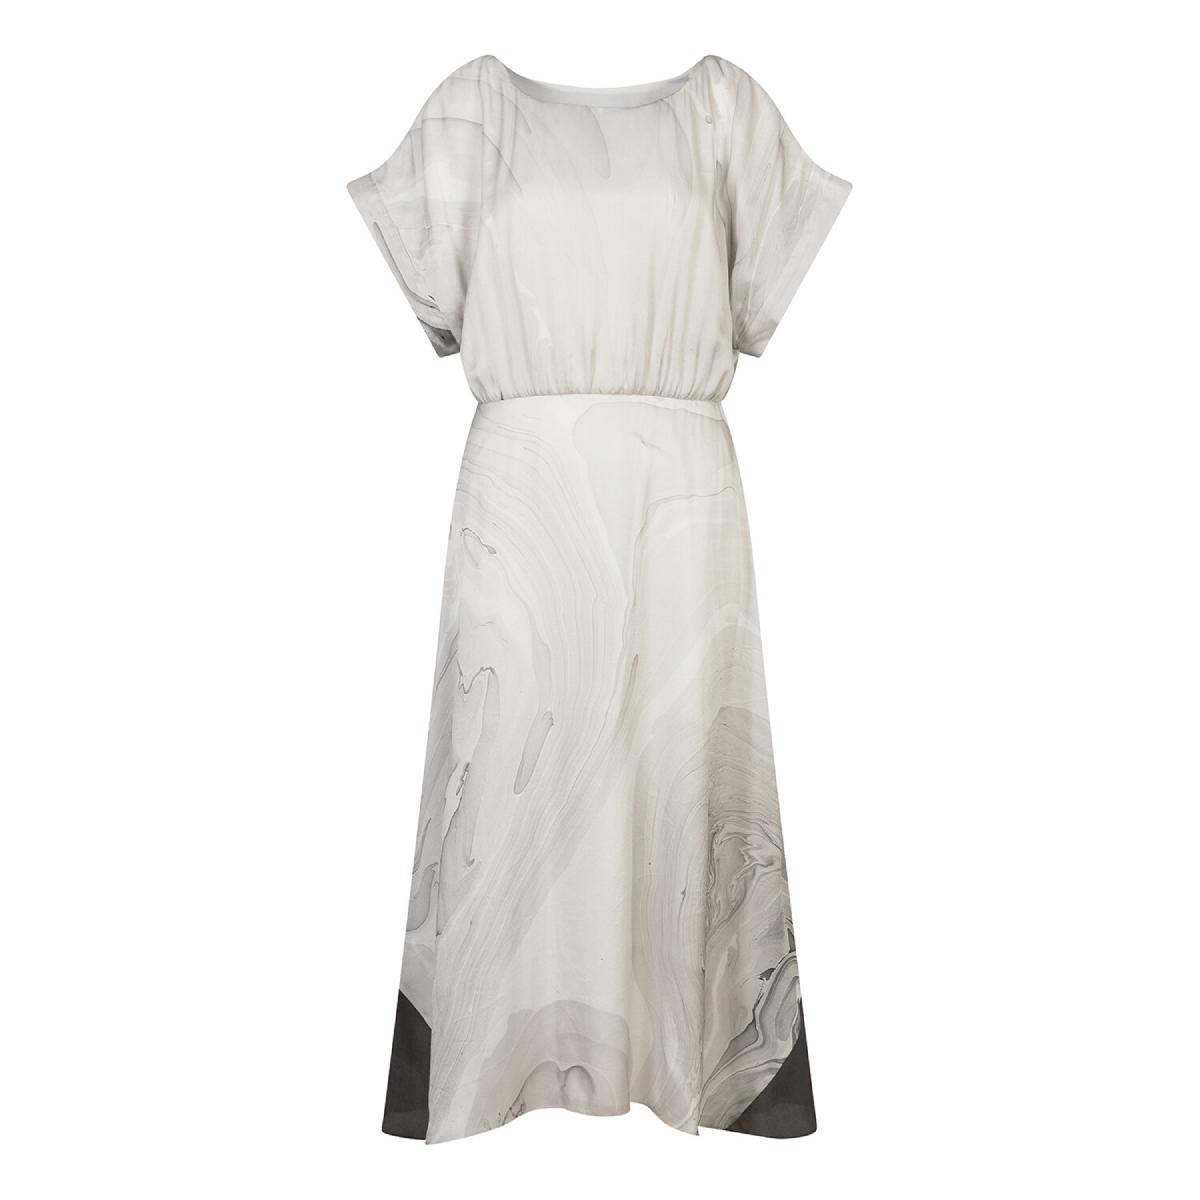 marbled panel dress